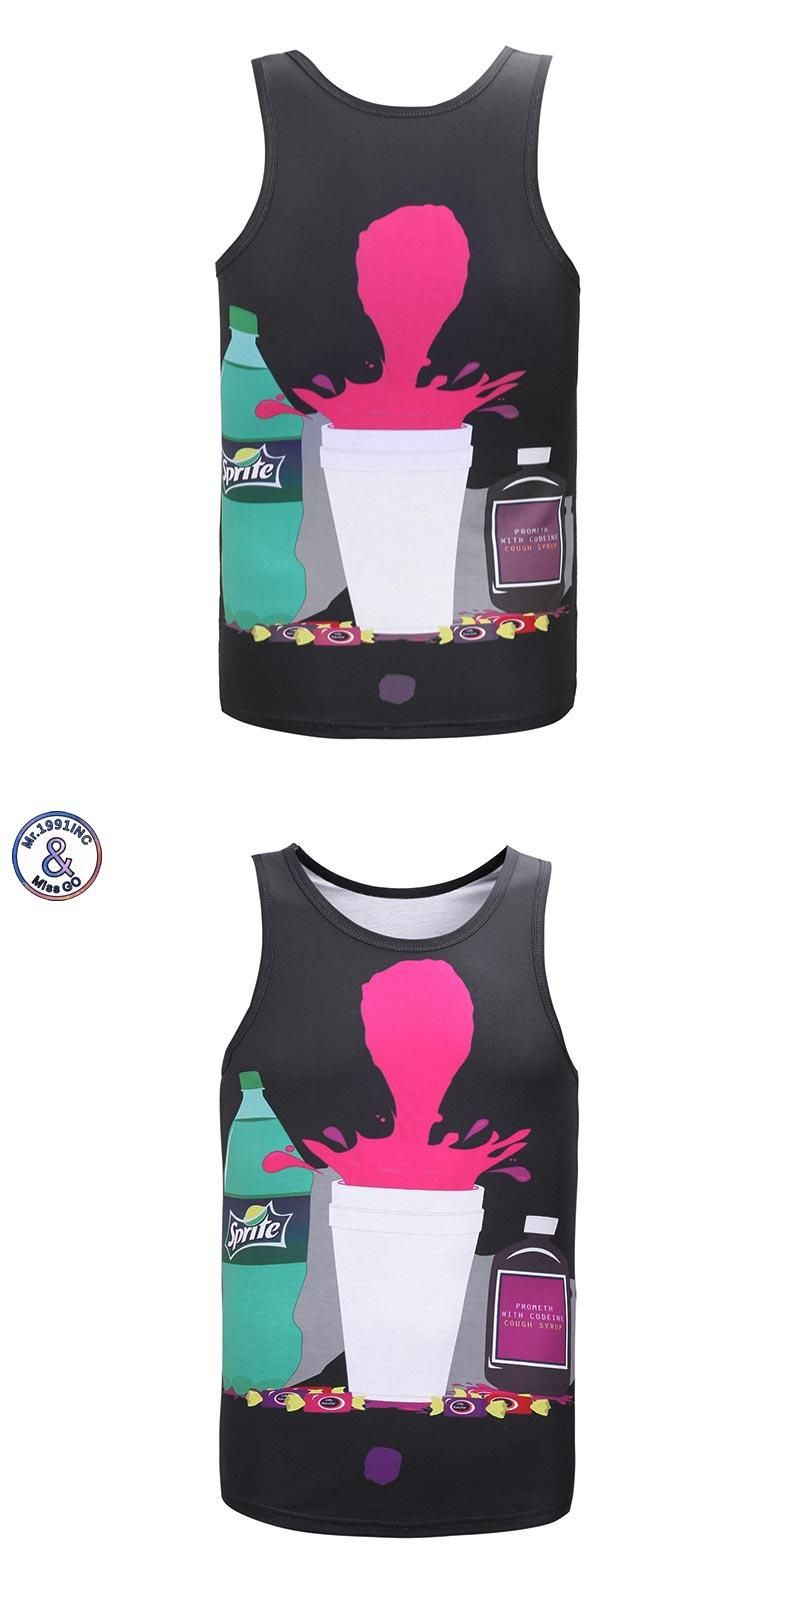 16b79ae538ce 2017 Mr.1991INC Newest fashion 3d vest men women tank tops funny print  Splash drink cool summer tops tees